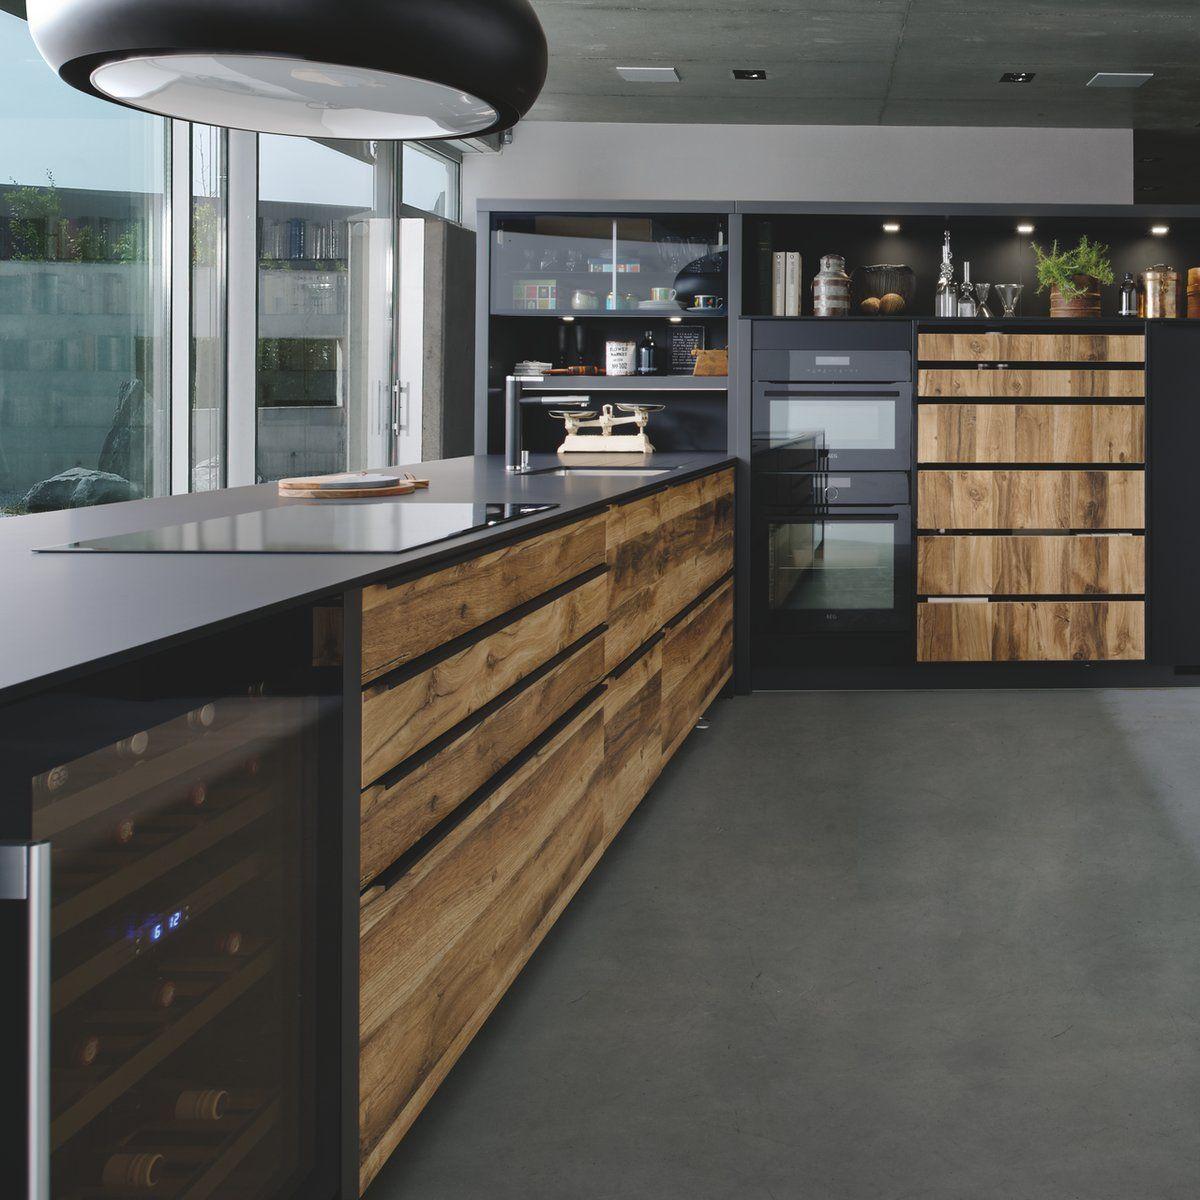 Soldes Schmidt Cuisine Moderne Idee Deco Cuisine Ouverte Amenagement Cuisine